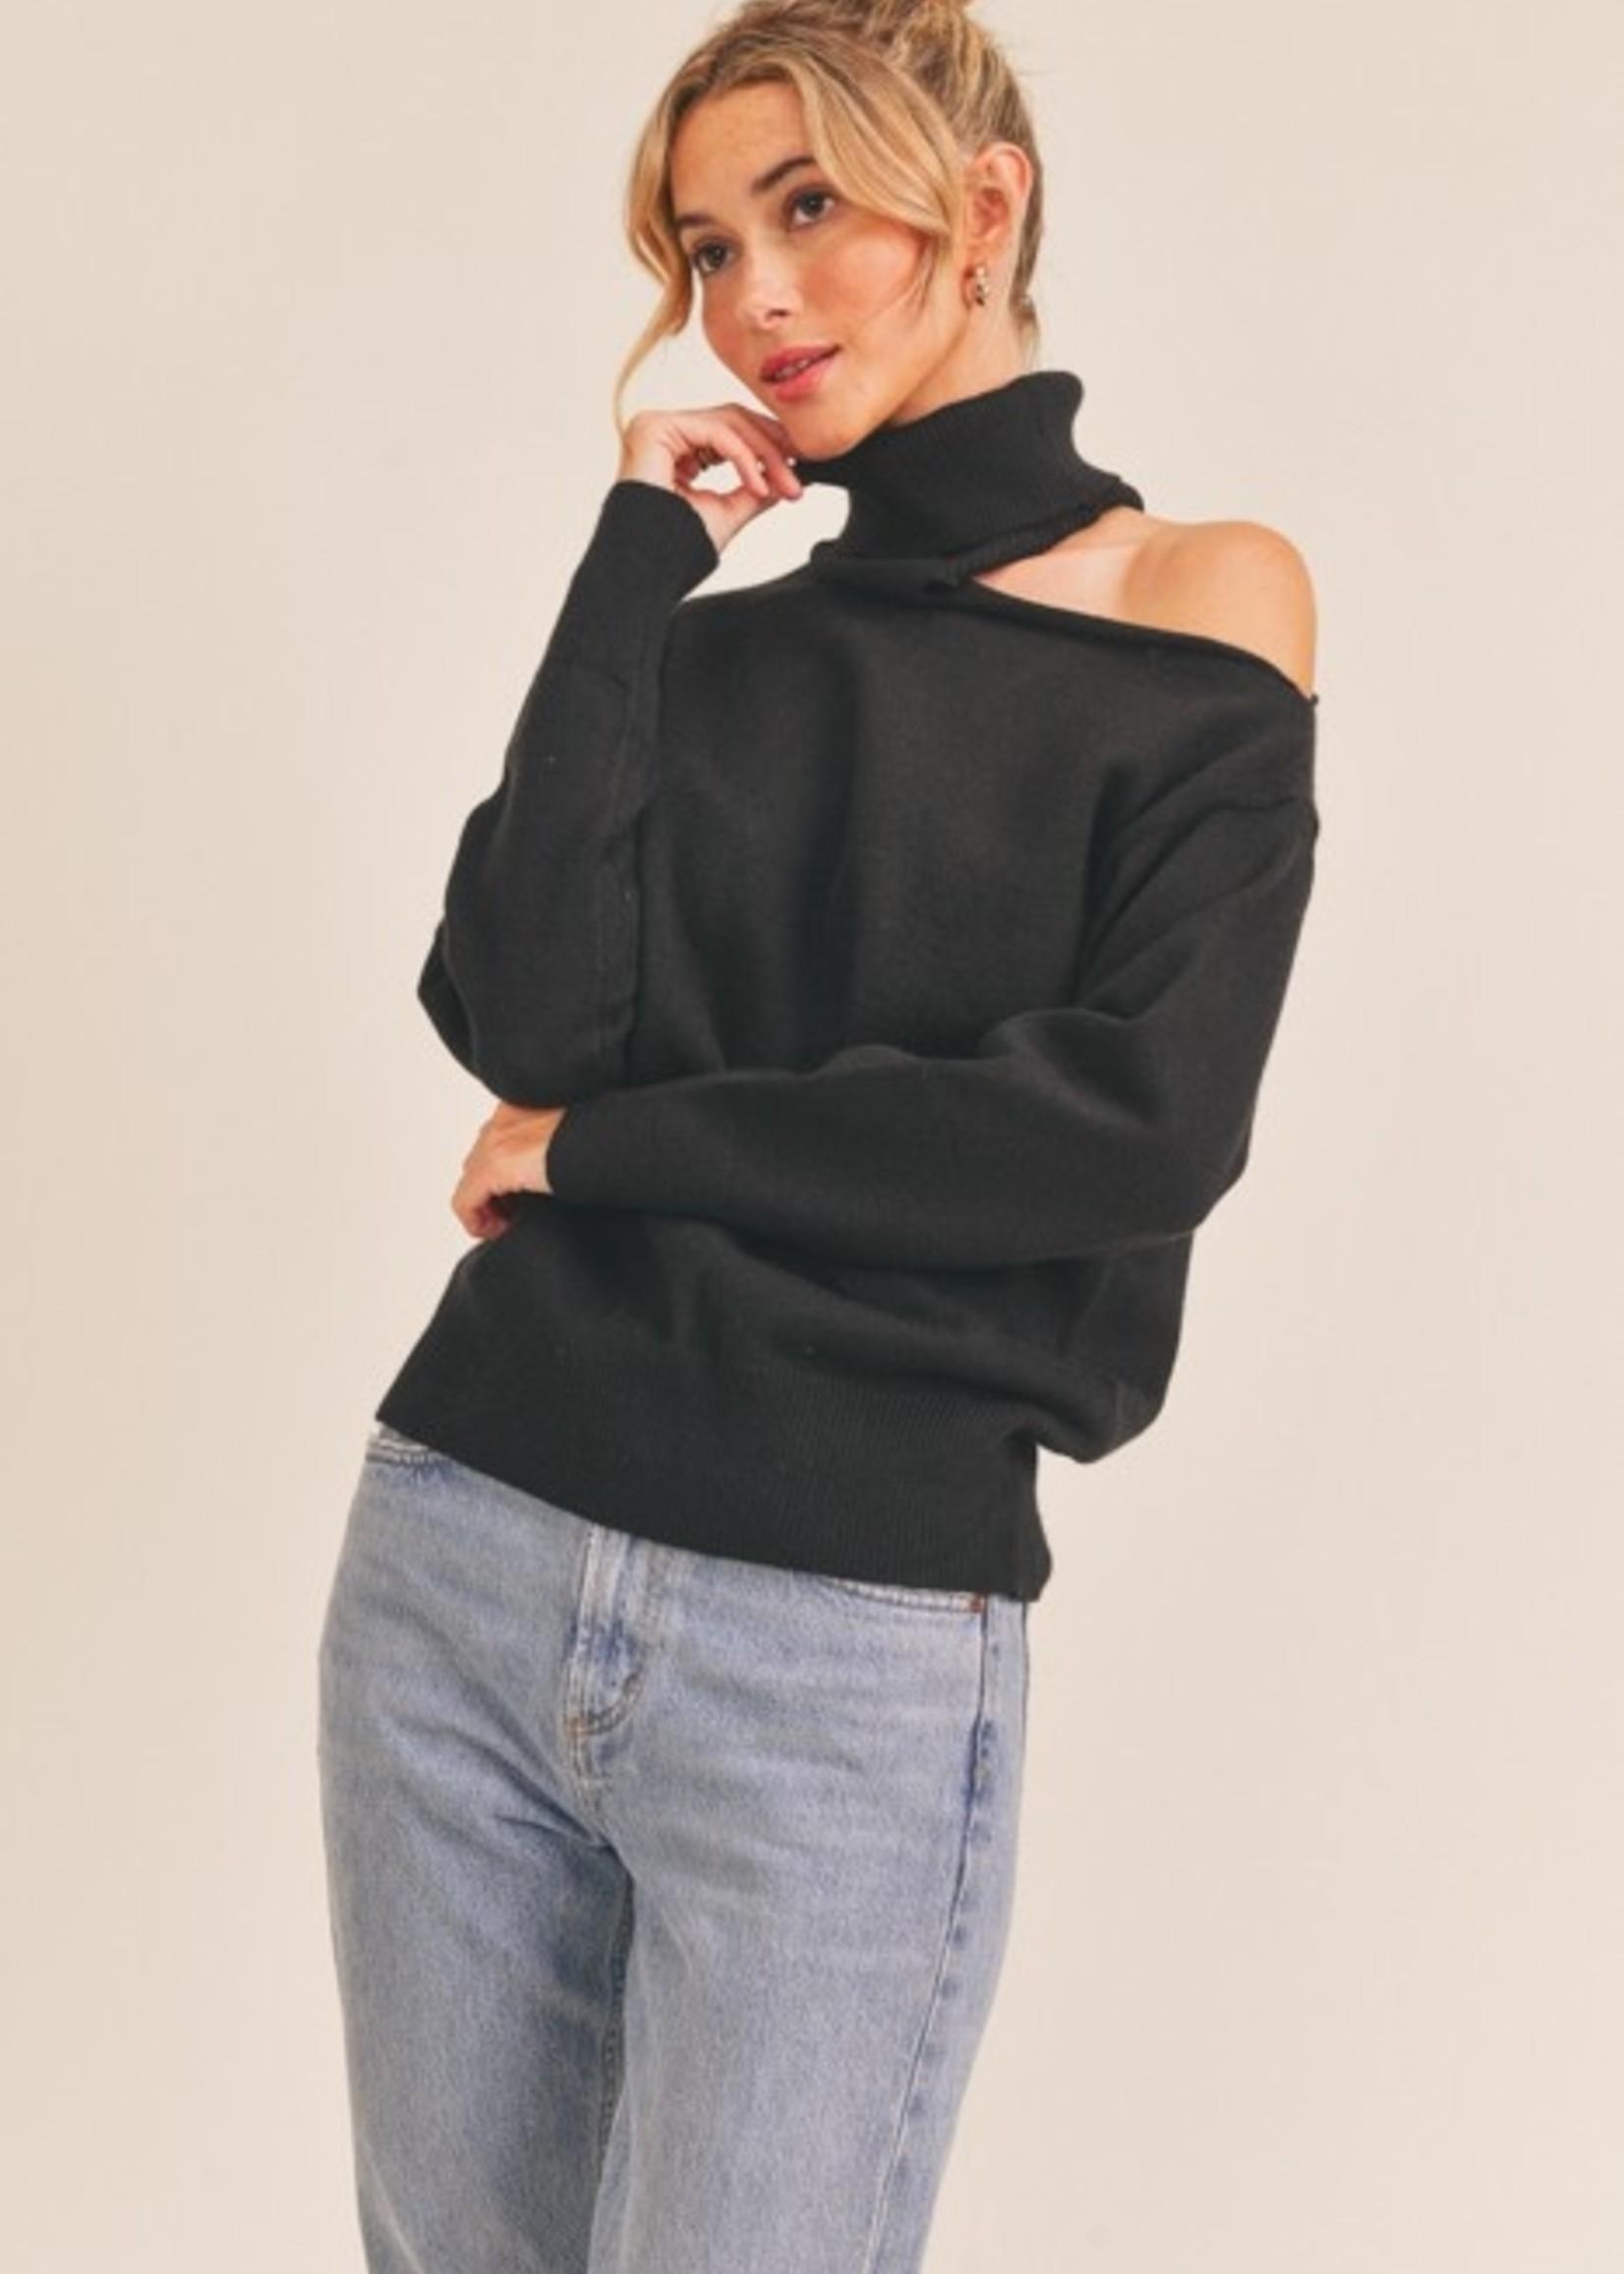 Lush Cutout Turtleneck Sweater - Black